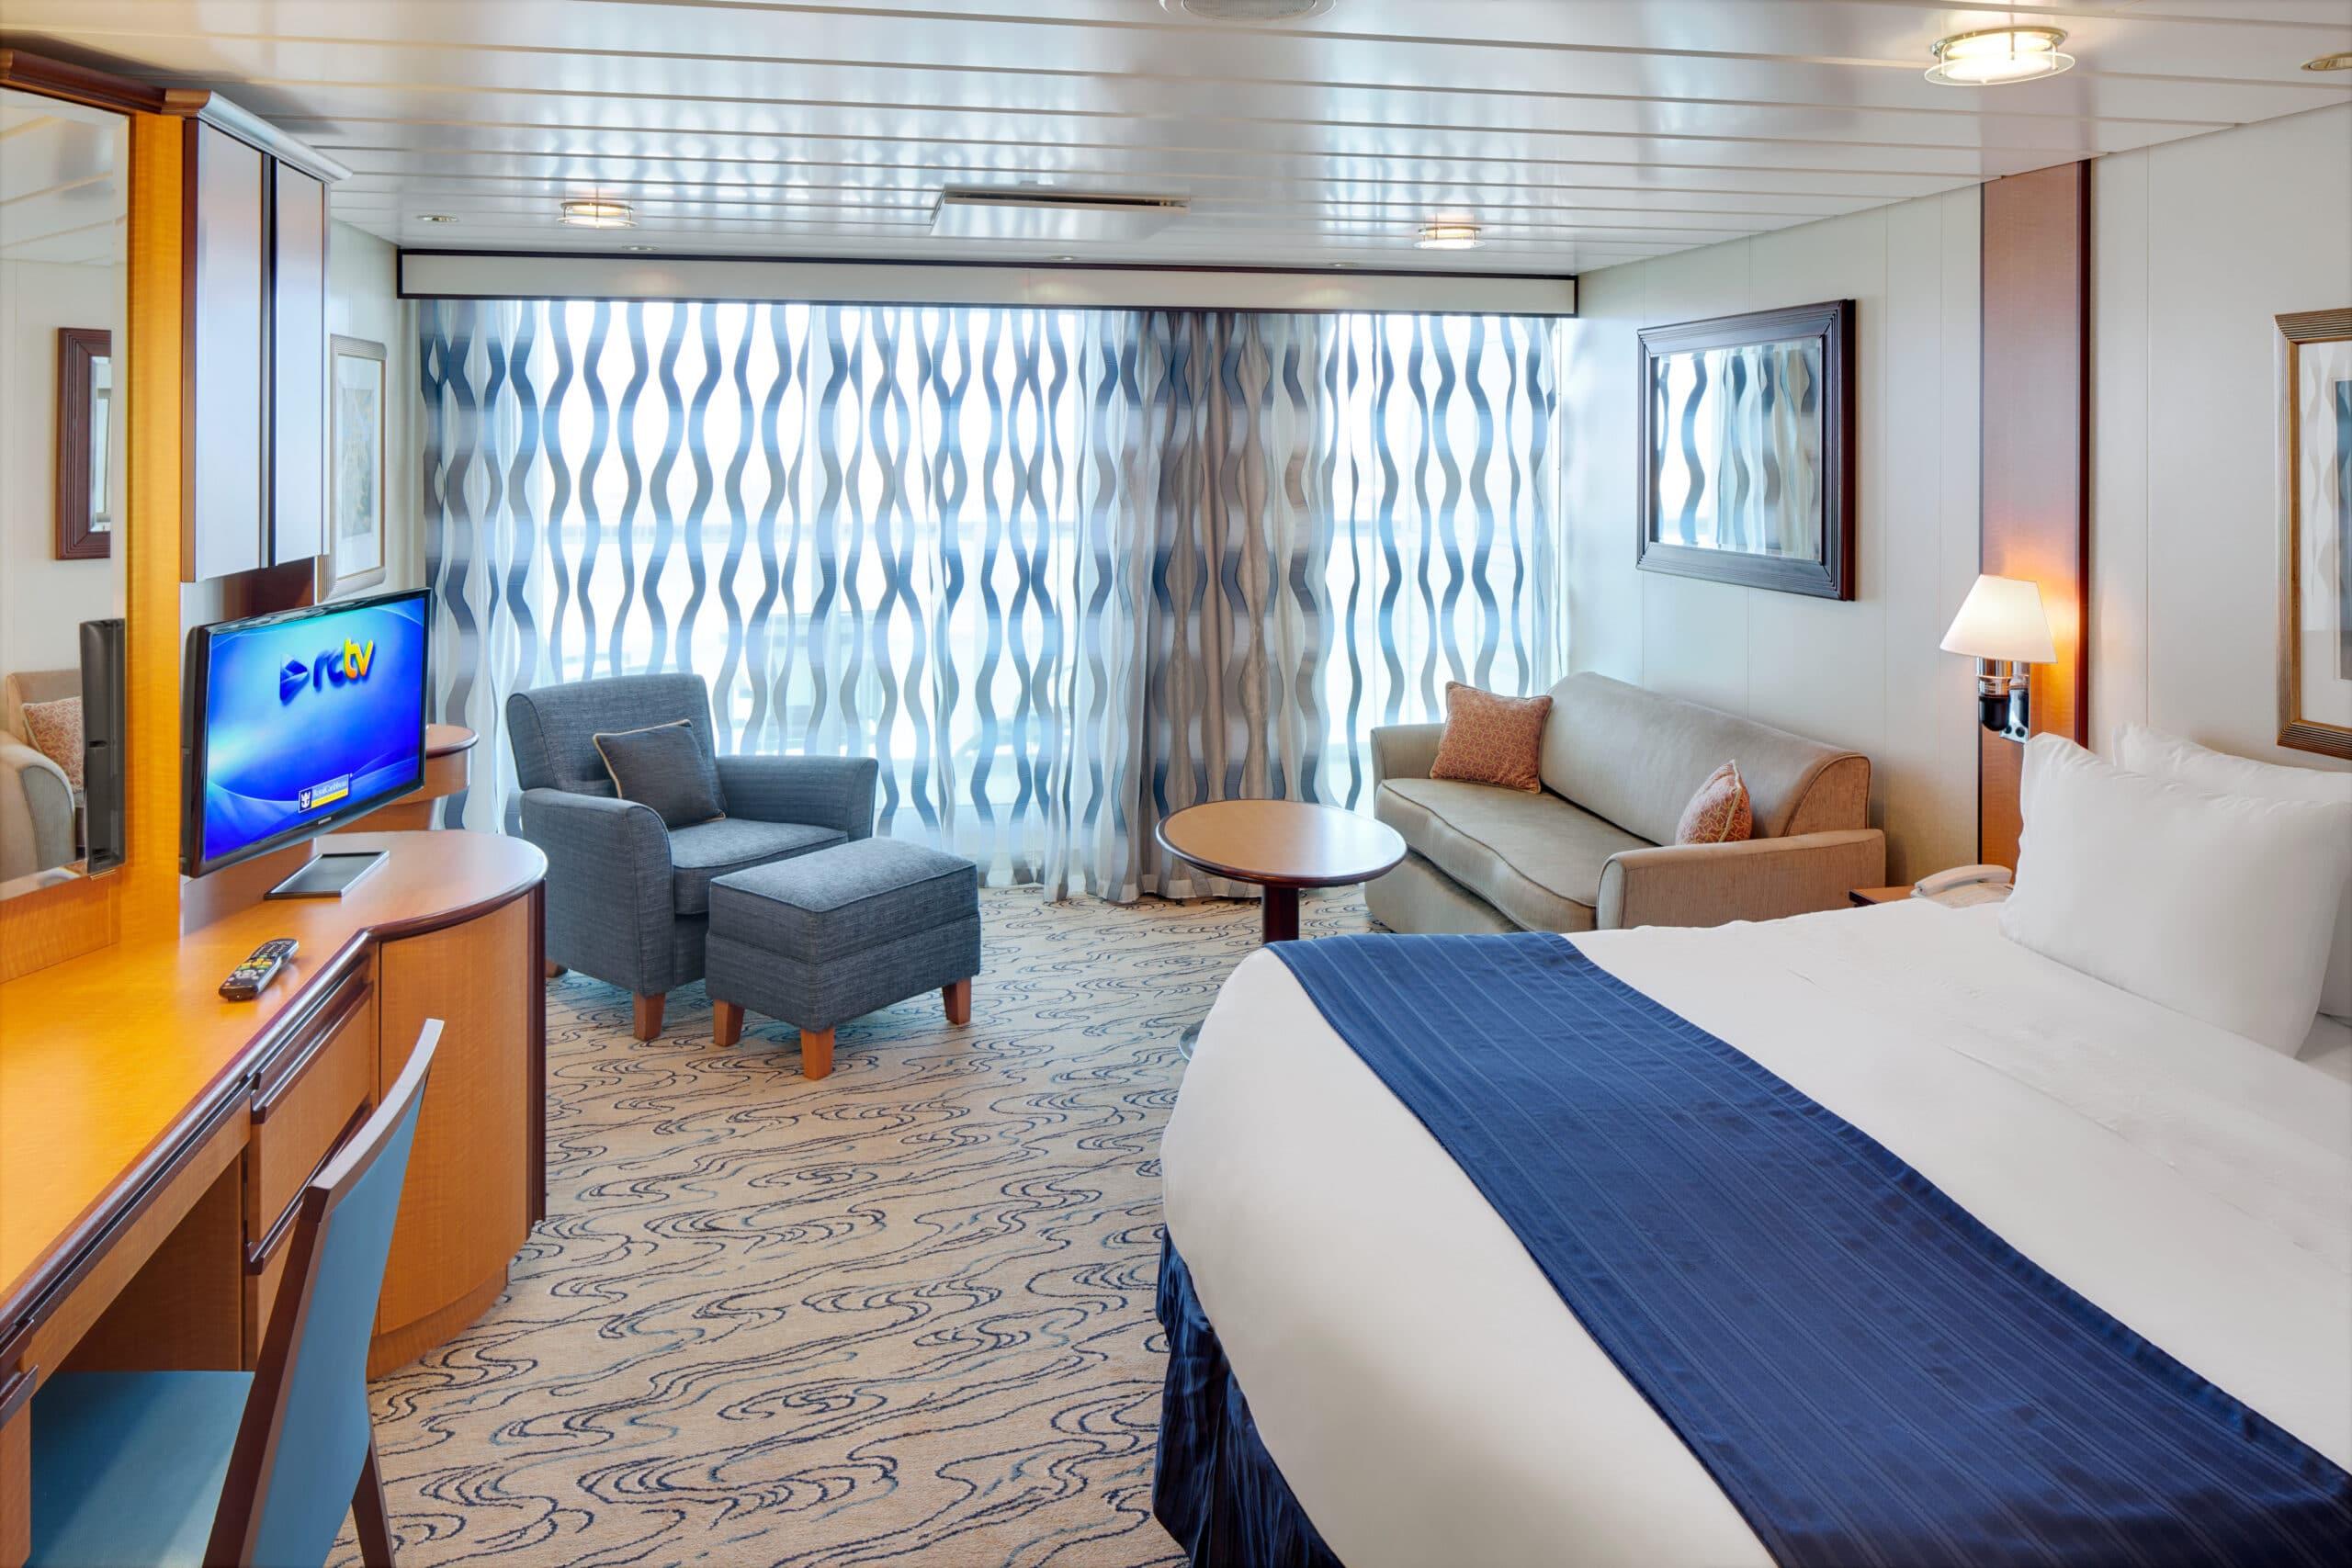 Royal-Caribbean-International-Jewel-of-the-Seas-schip-cruiseschip-categorie-J3-junior-suite